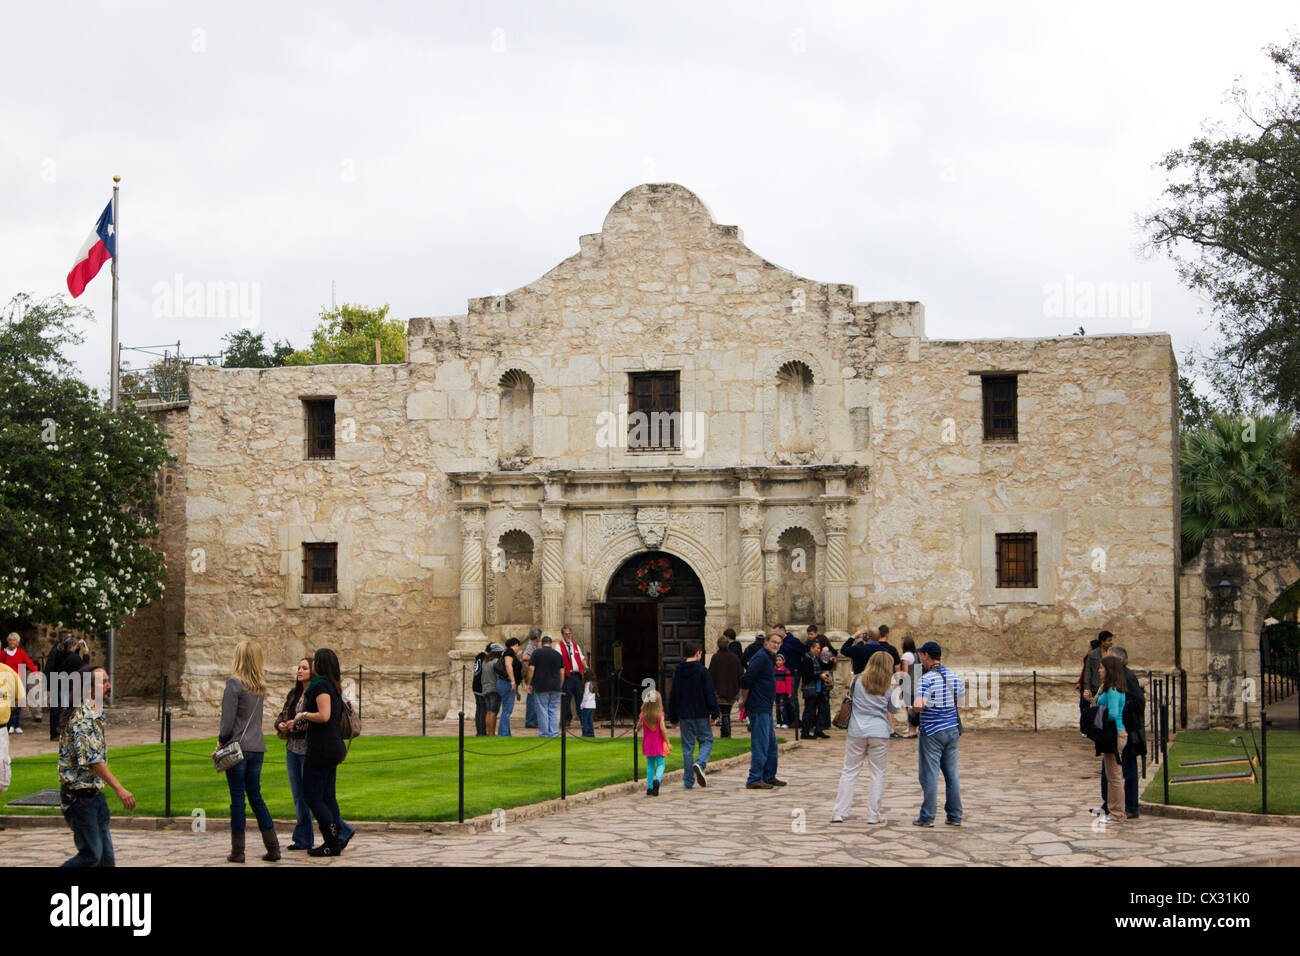 Tourists visiting Alamo, San Antonio Texas - Stock Image